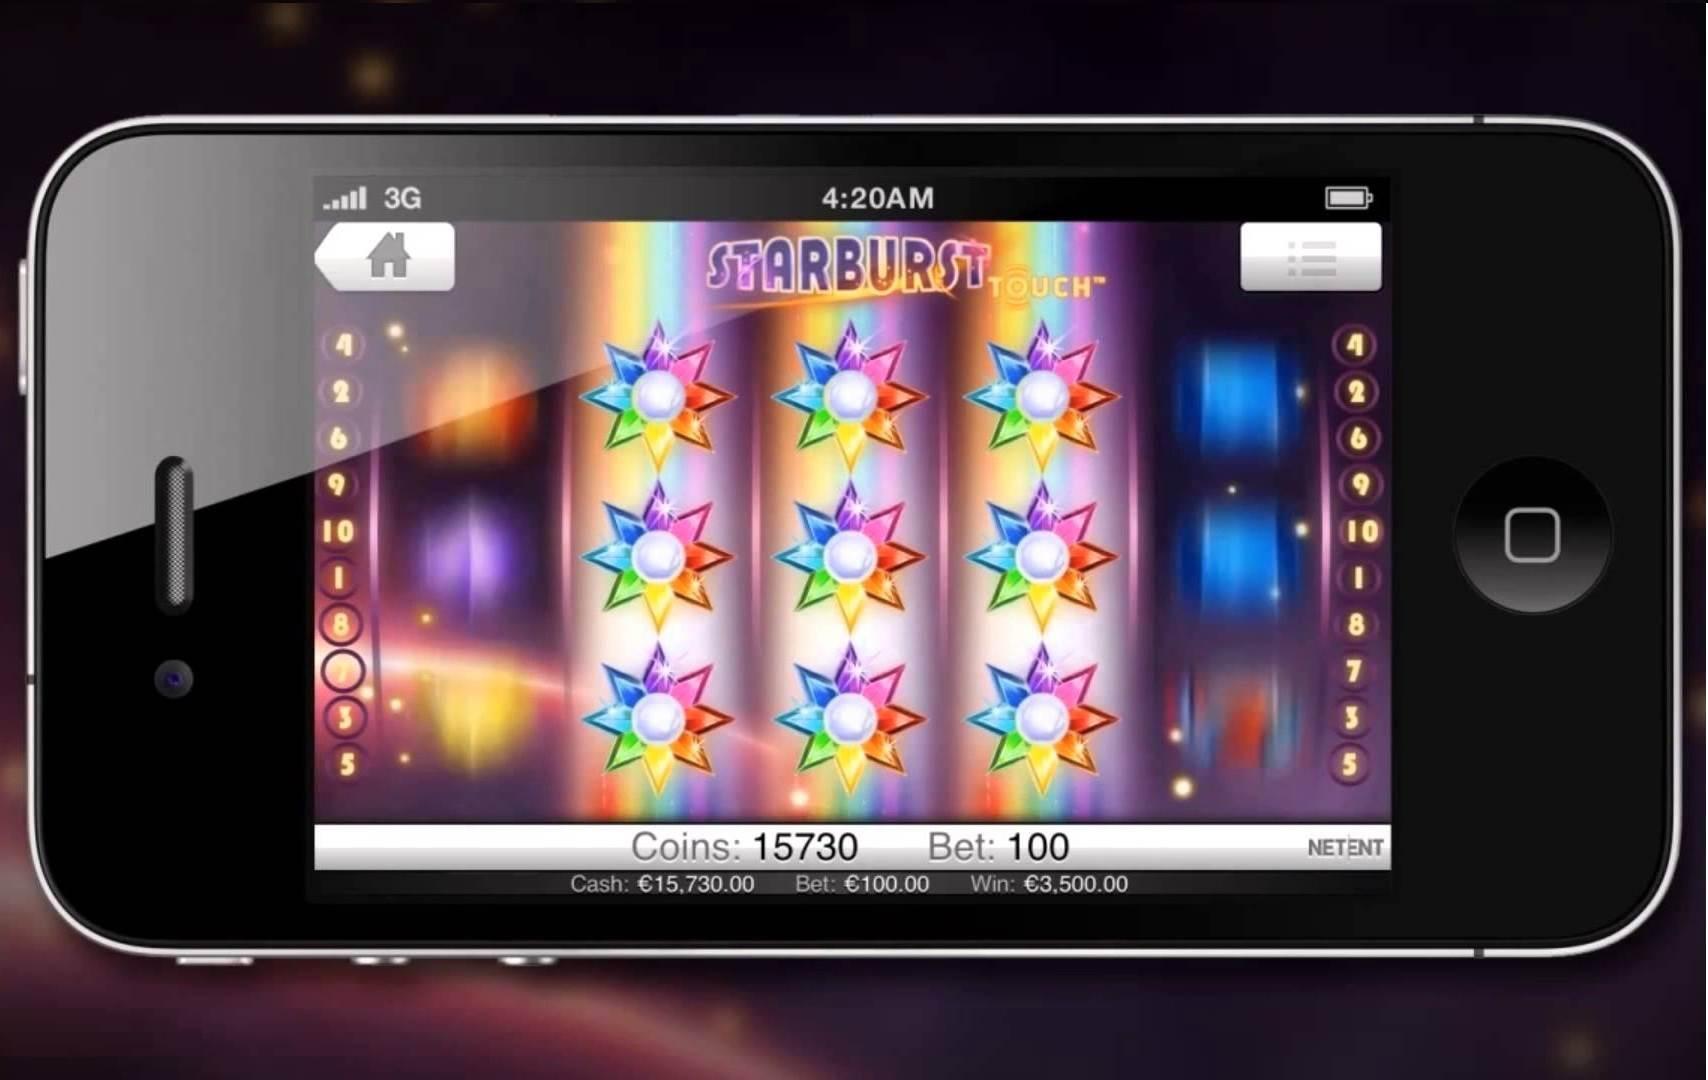 Starburst Mobile Slots